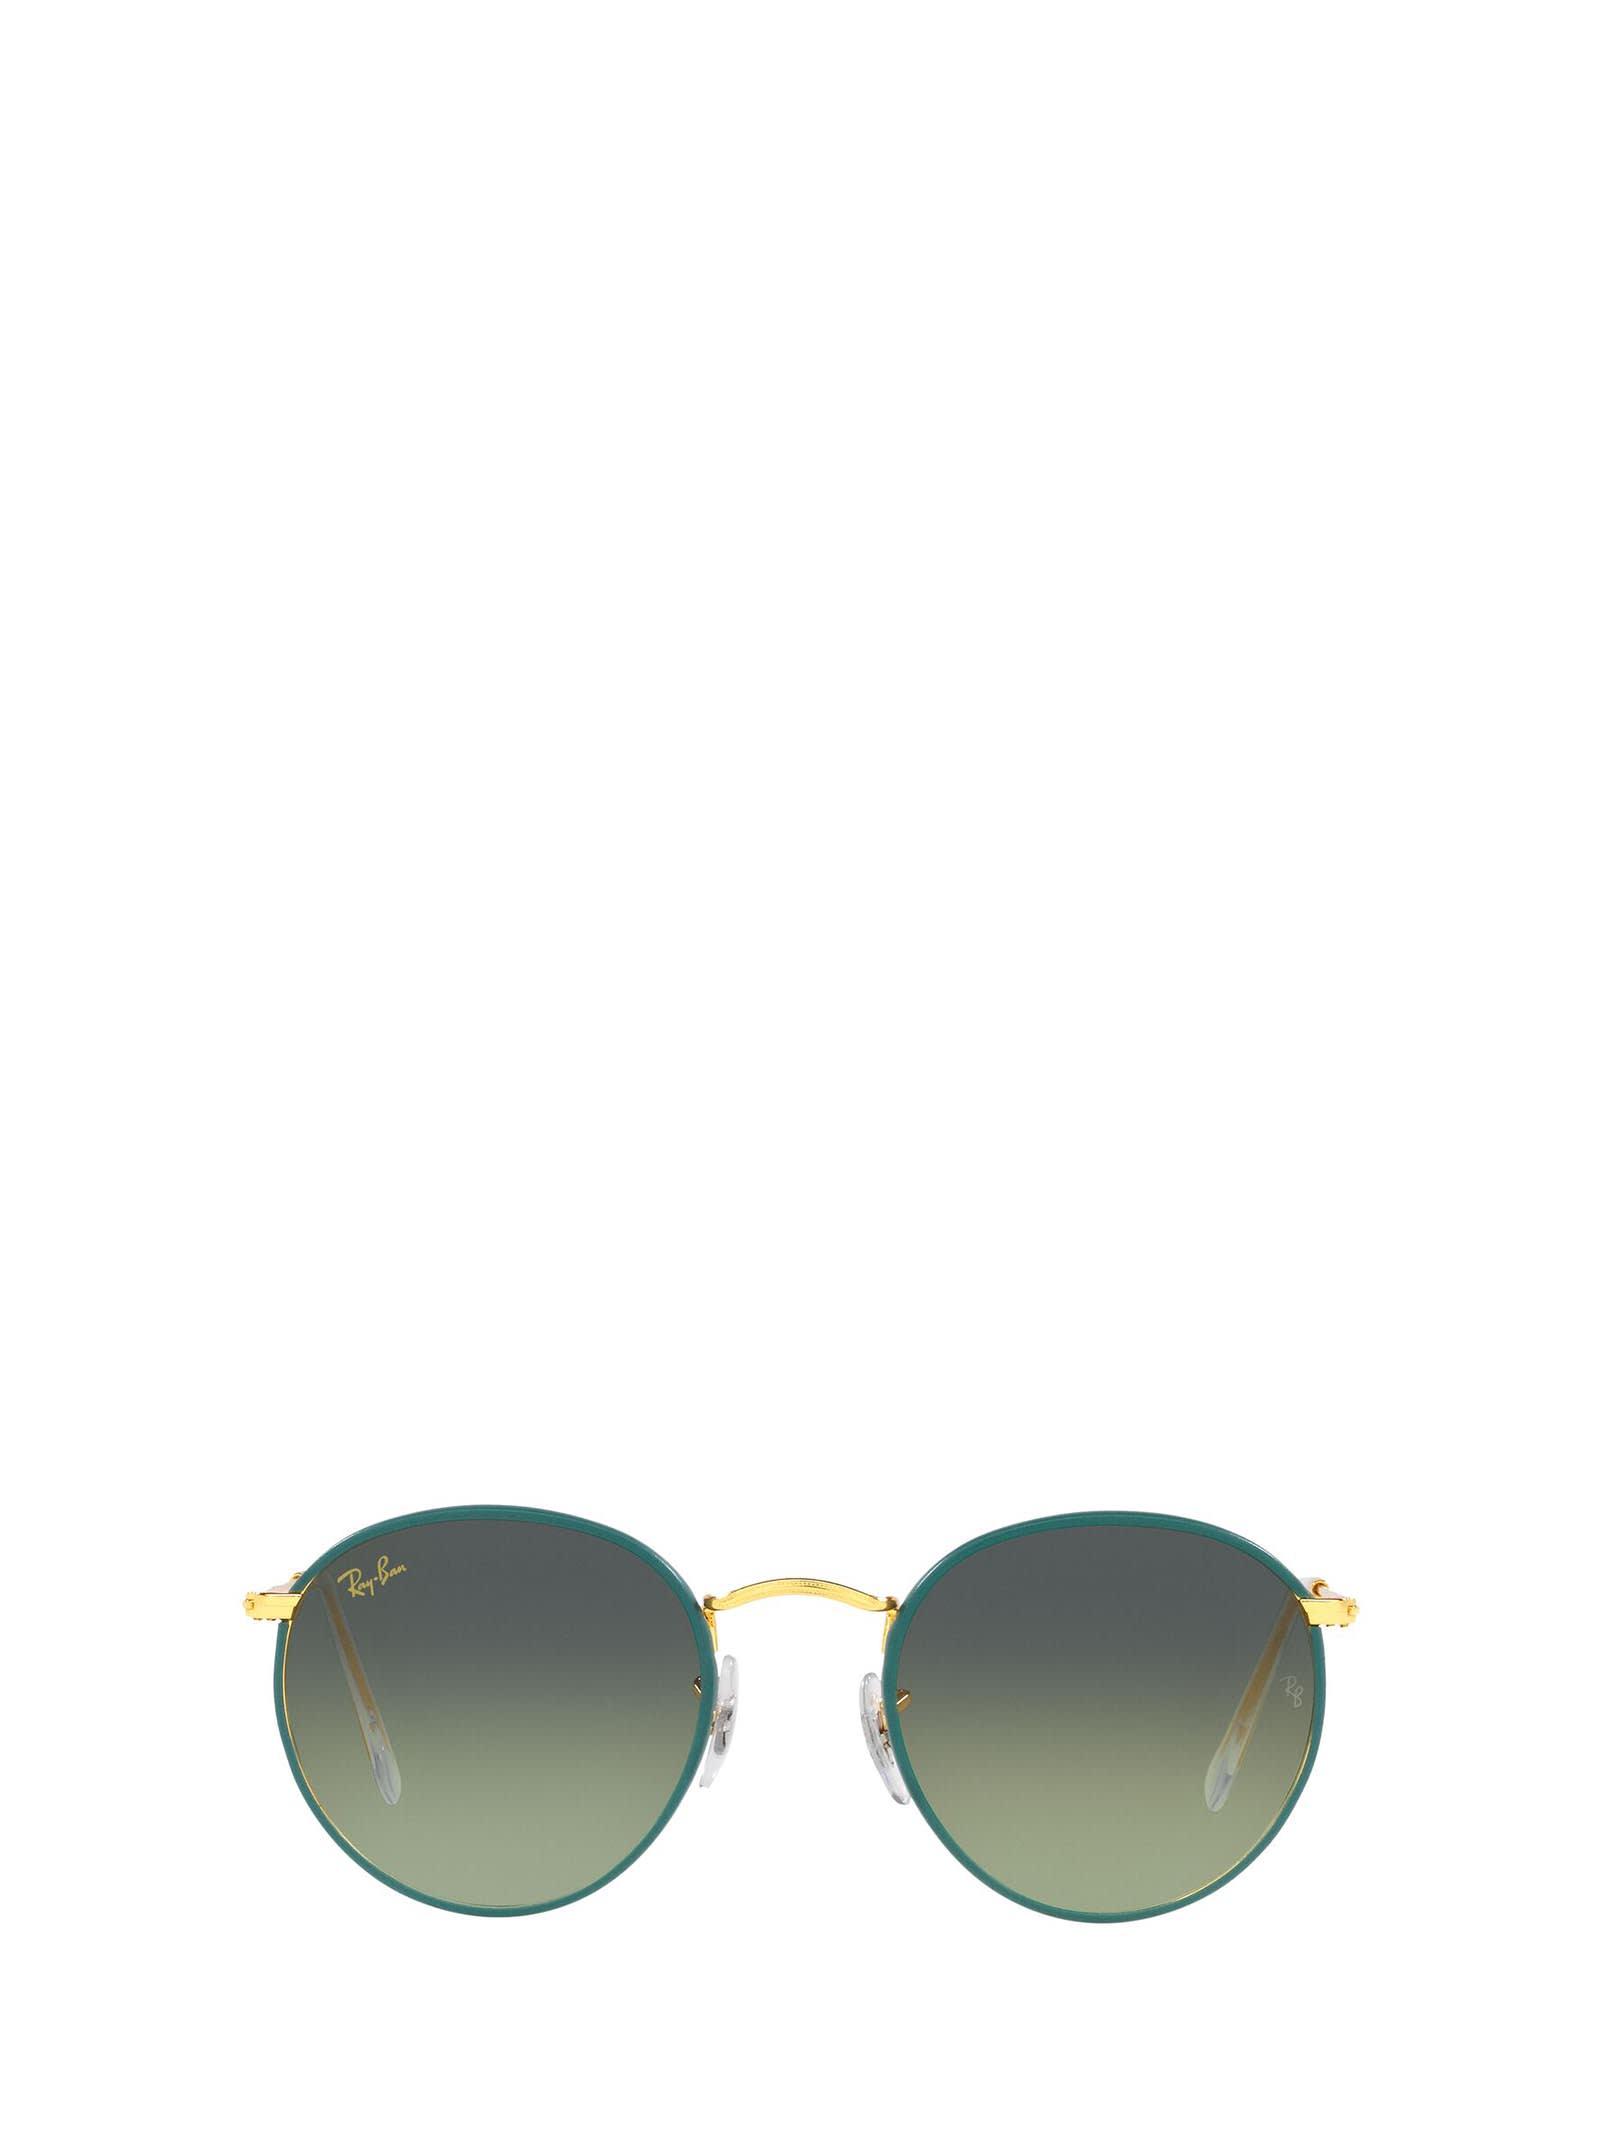 Ray-Ban Ray-ban Rb3447jm Petroleum On A Legend Gold Sunglasses